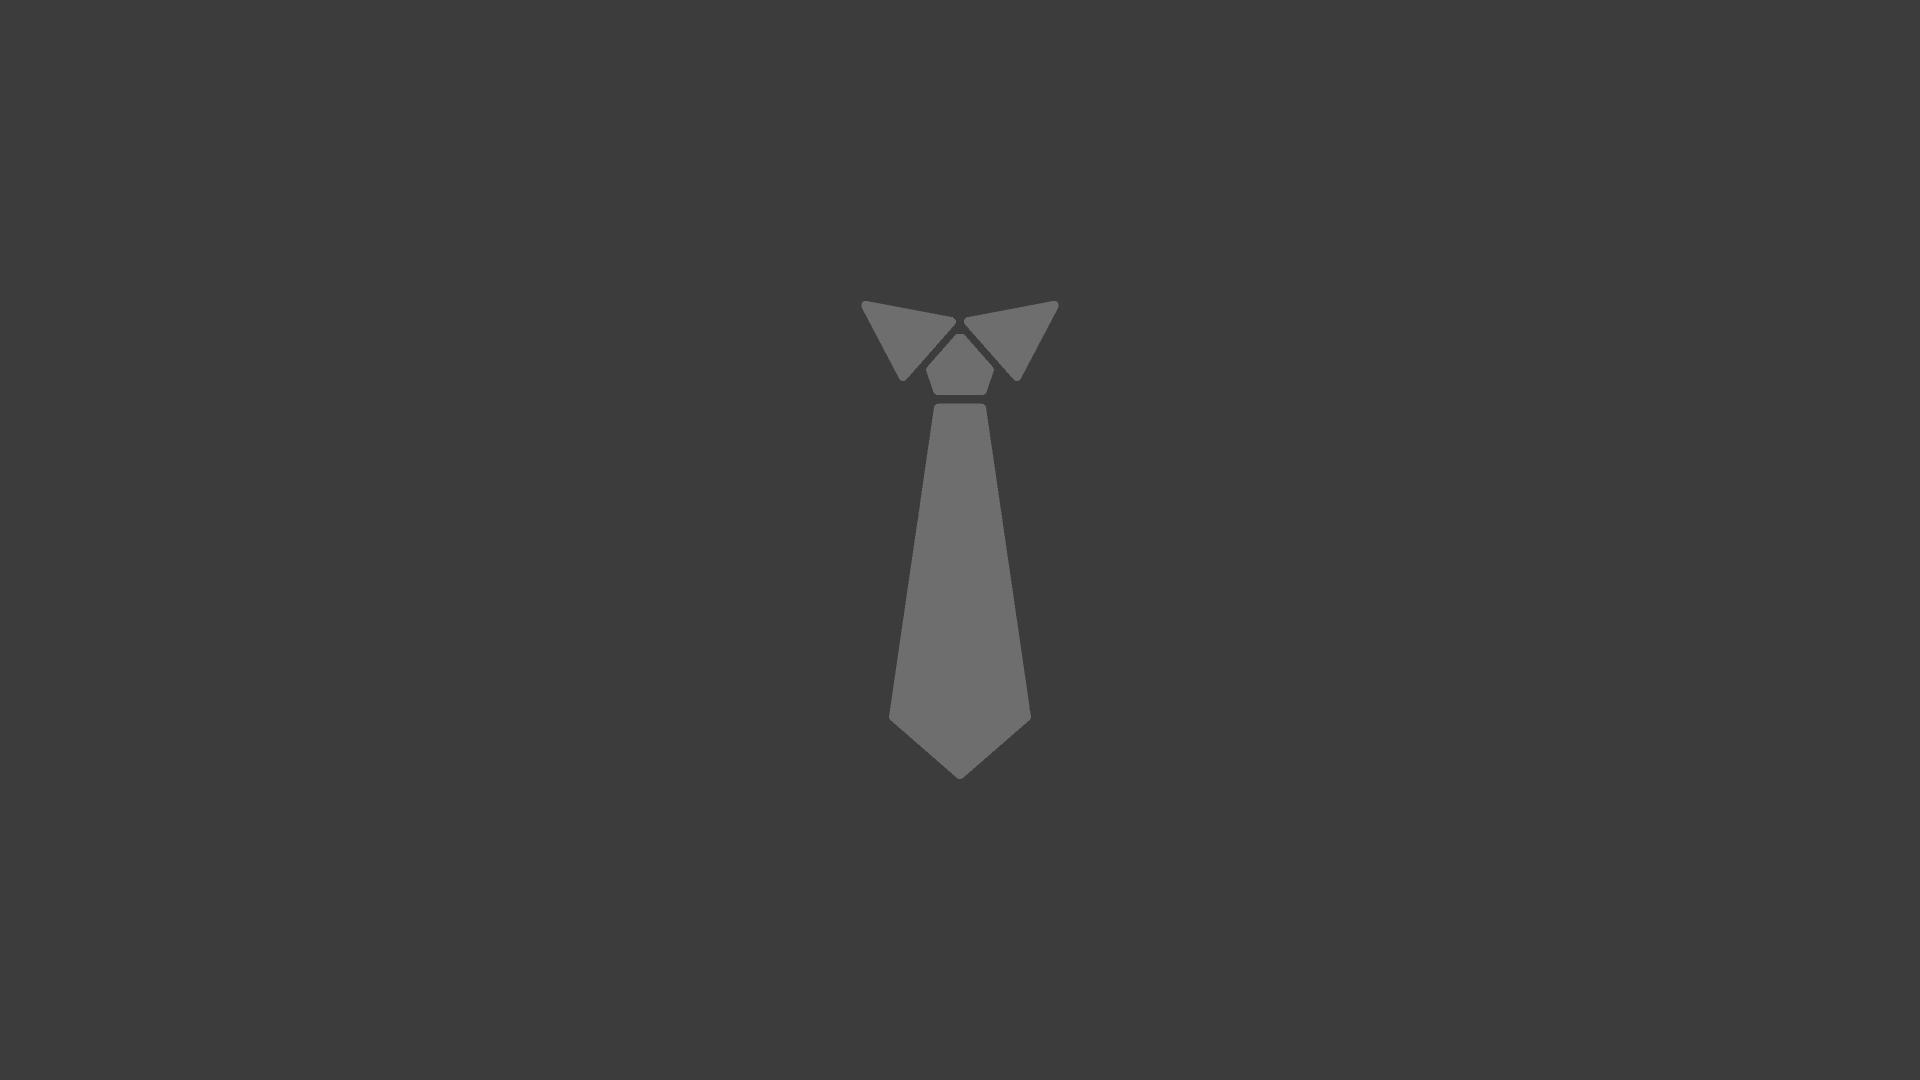 tie minimalism hd artist 4k wallpapers images